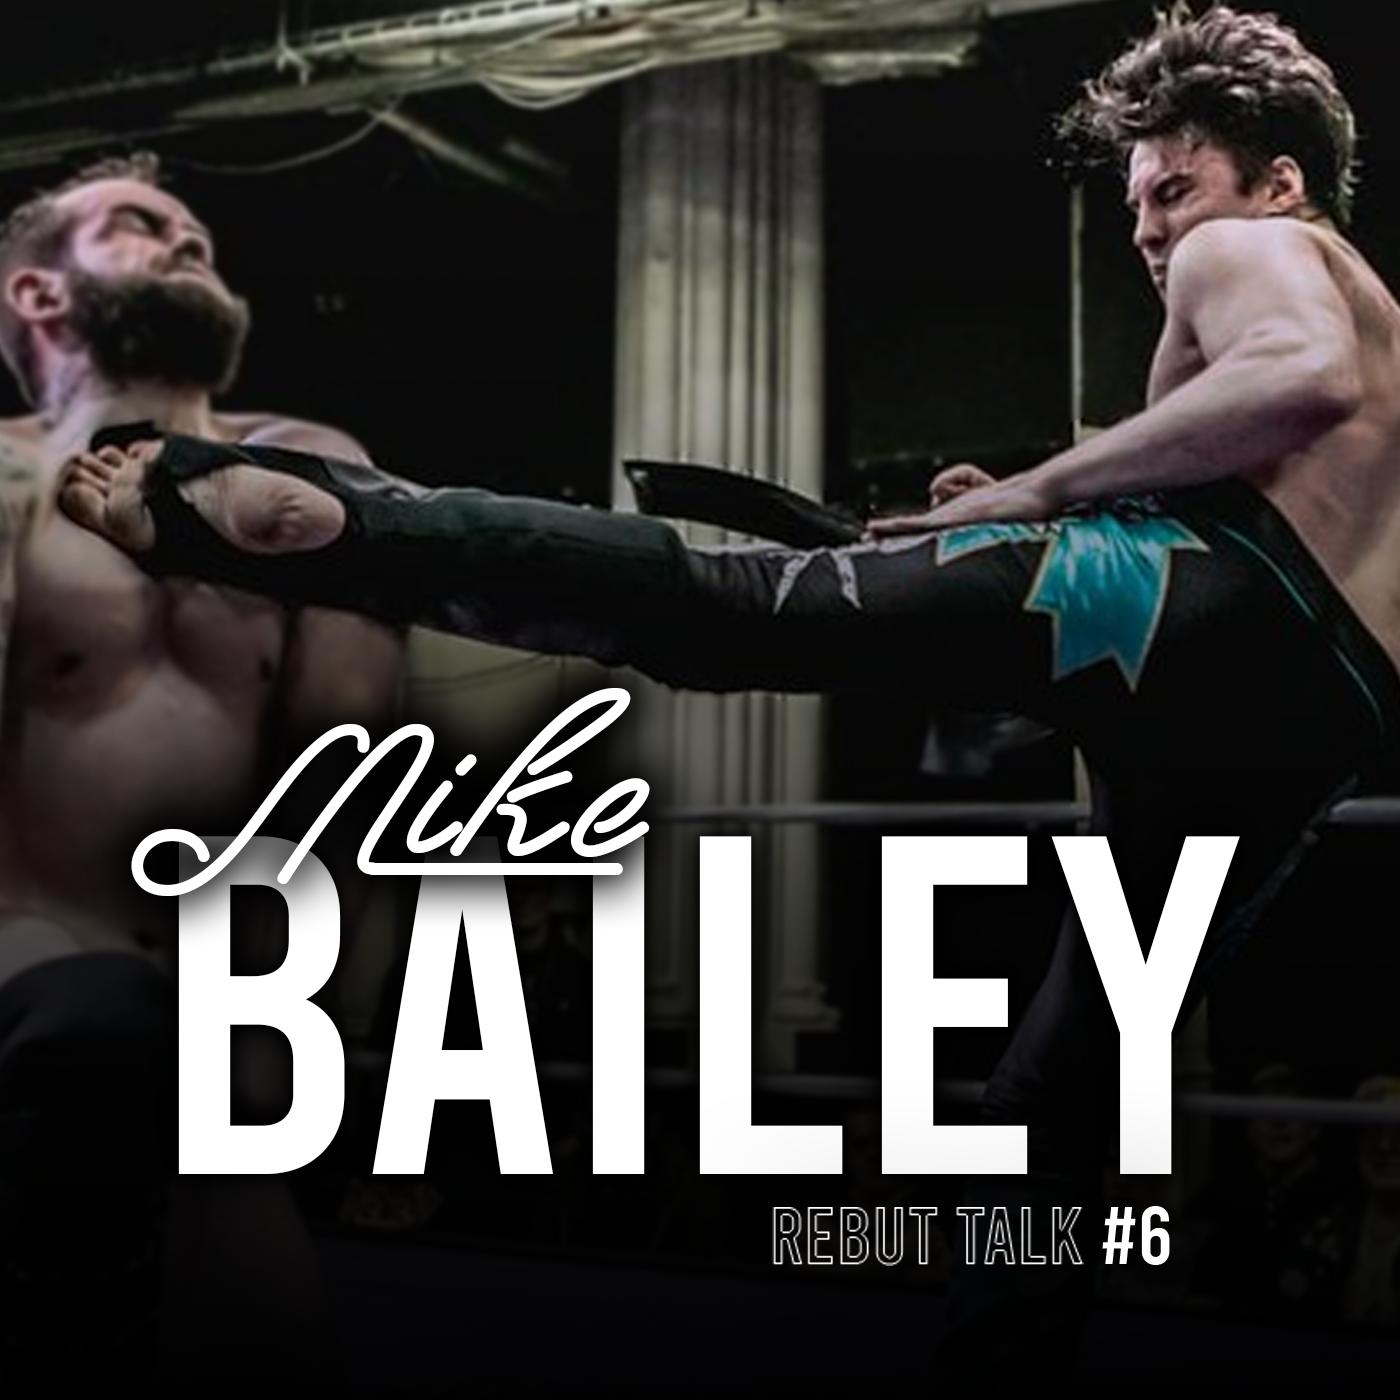 Rebut Talk #5 : Entrevue avec Mike Bailey